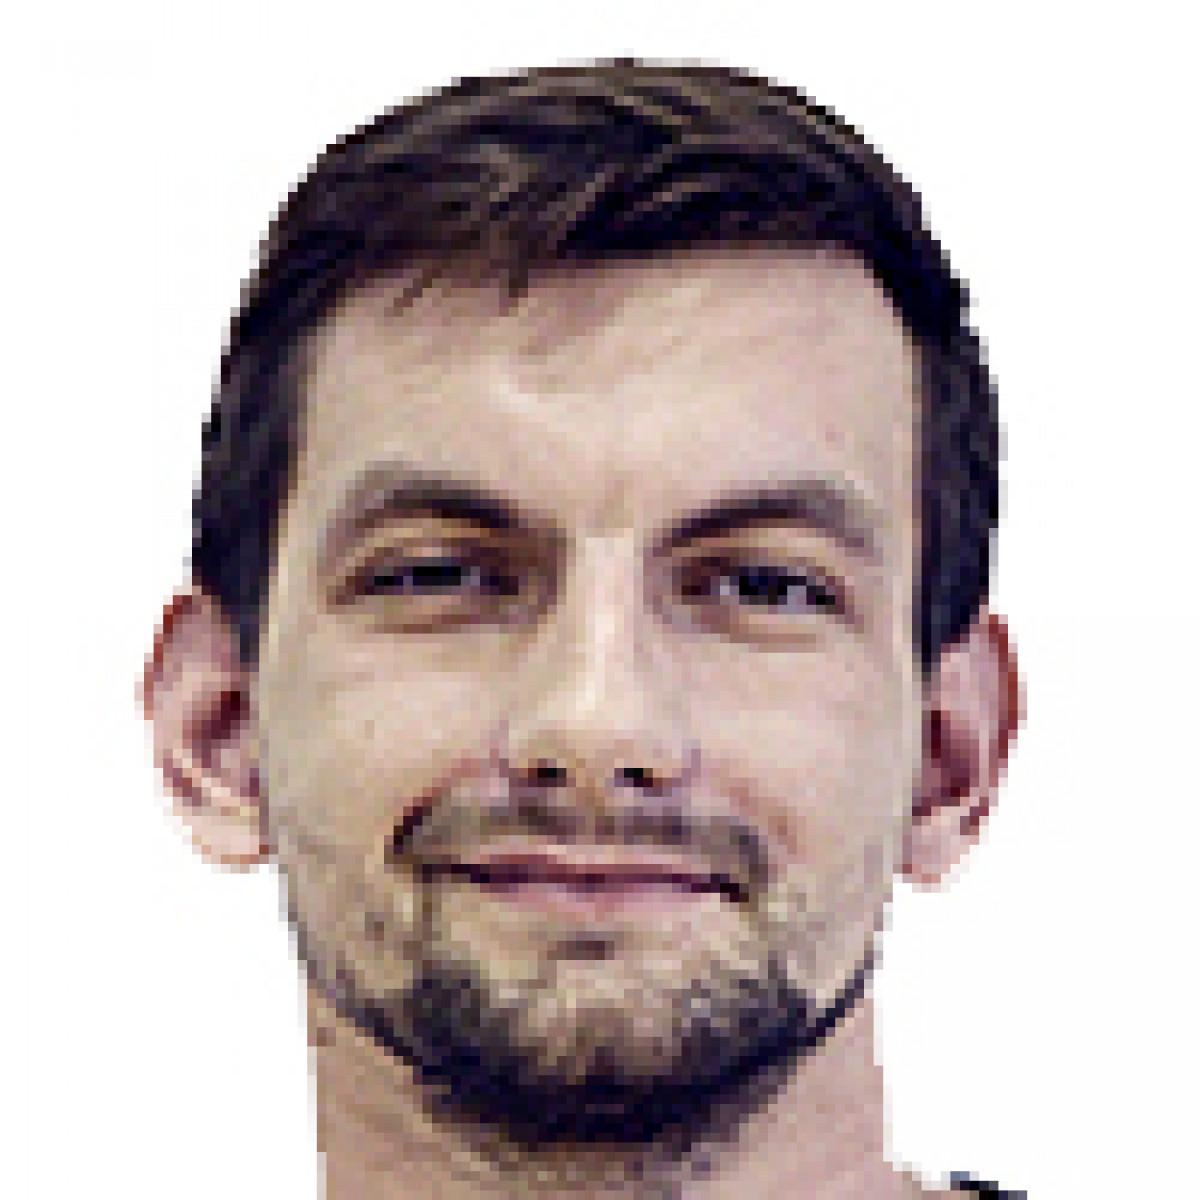 Michal Marek